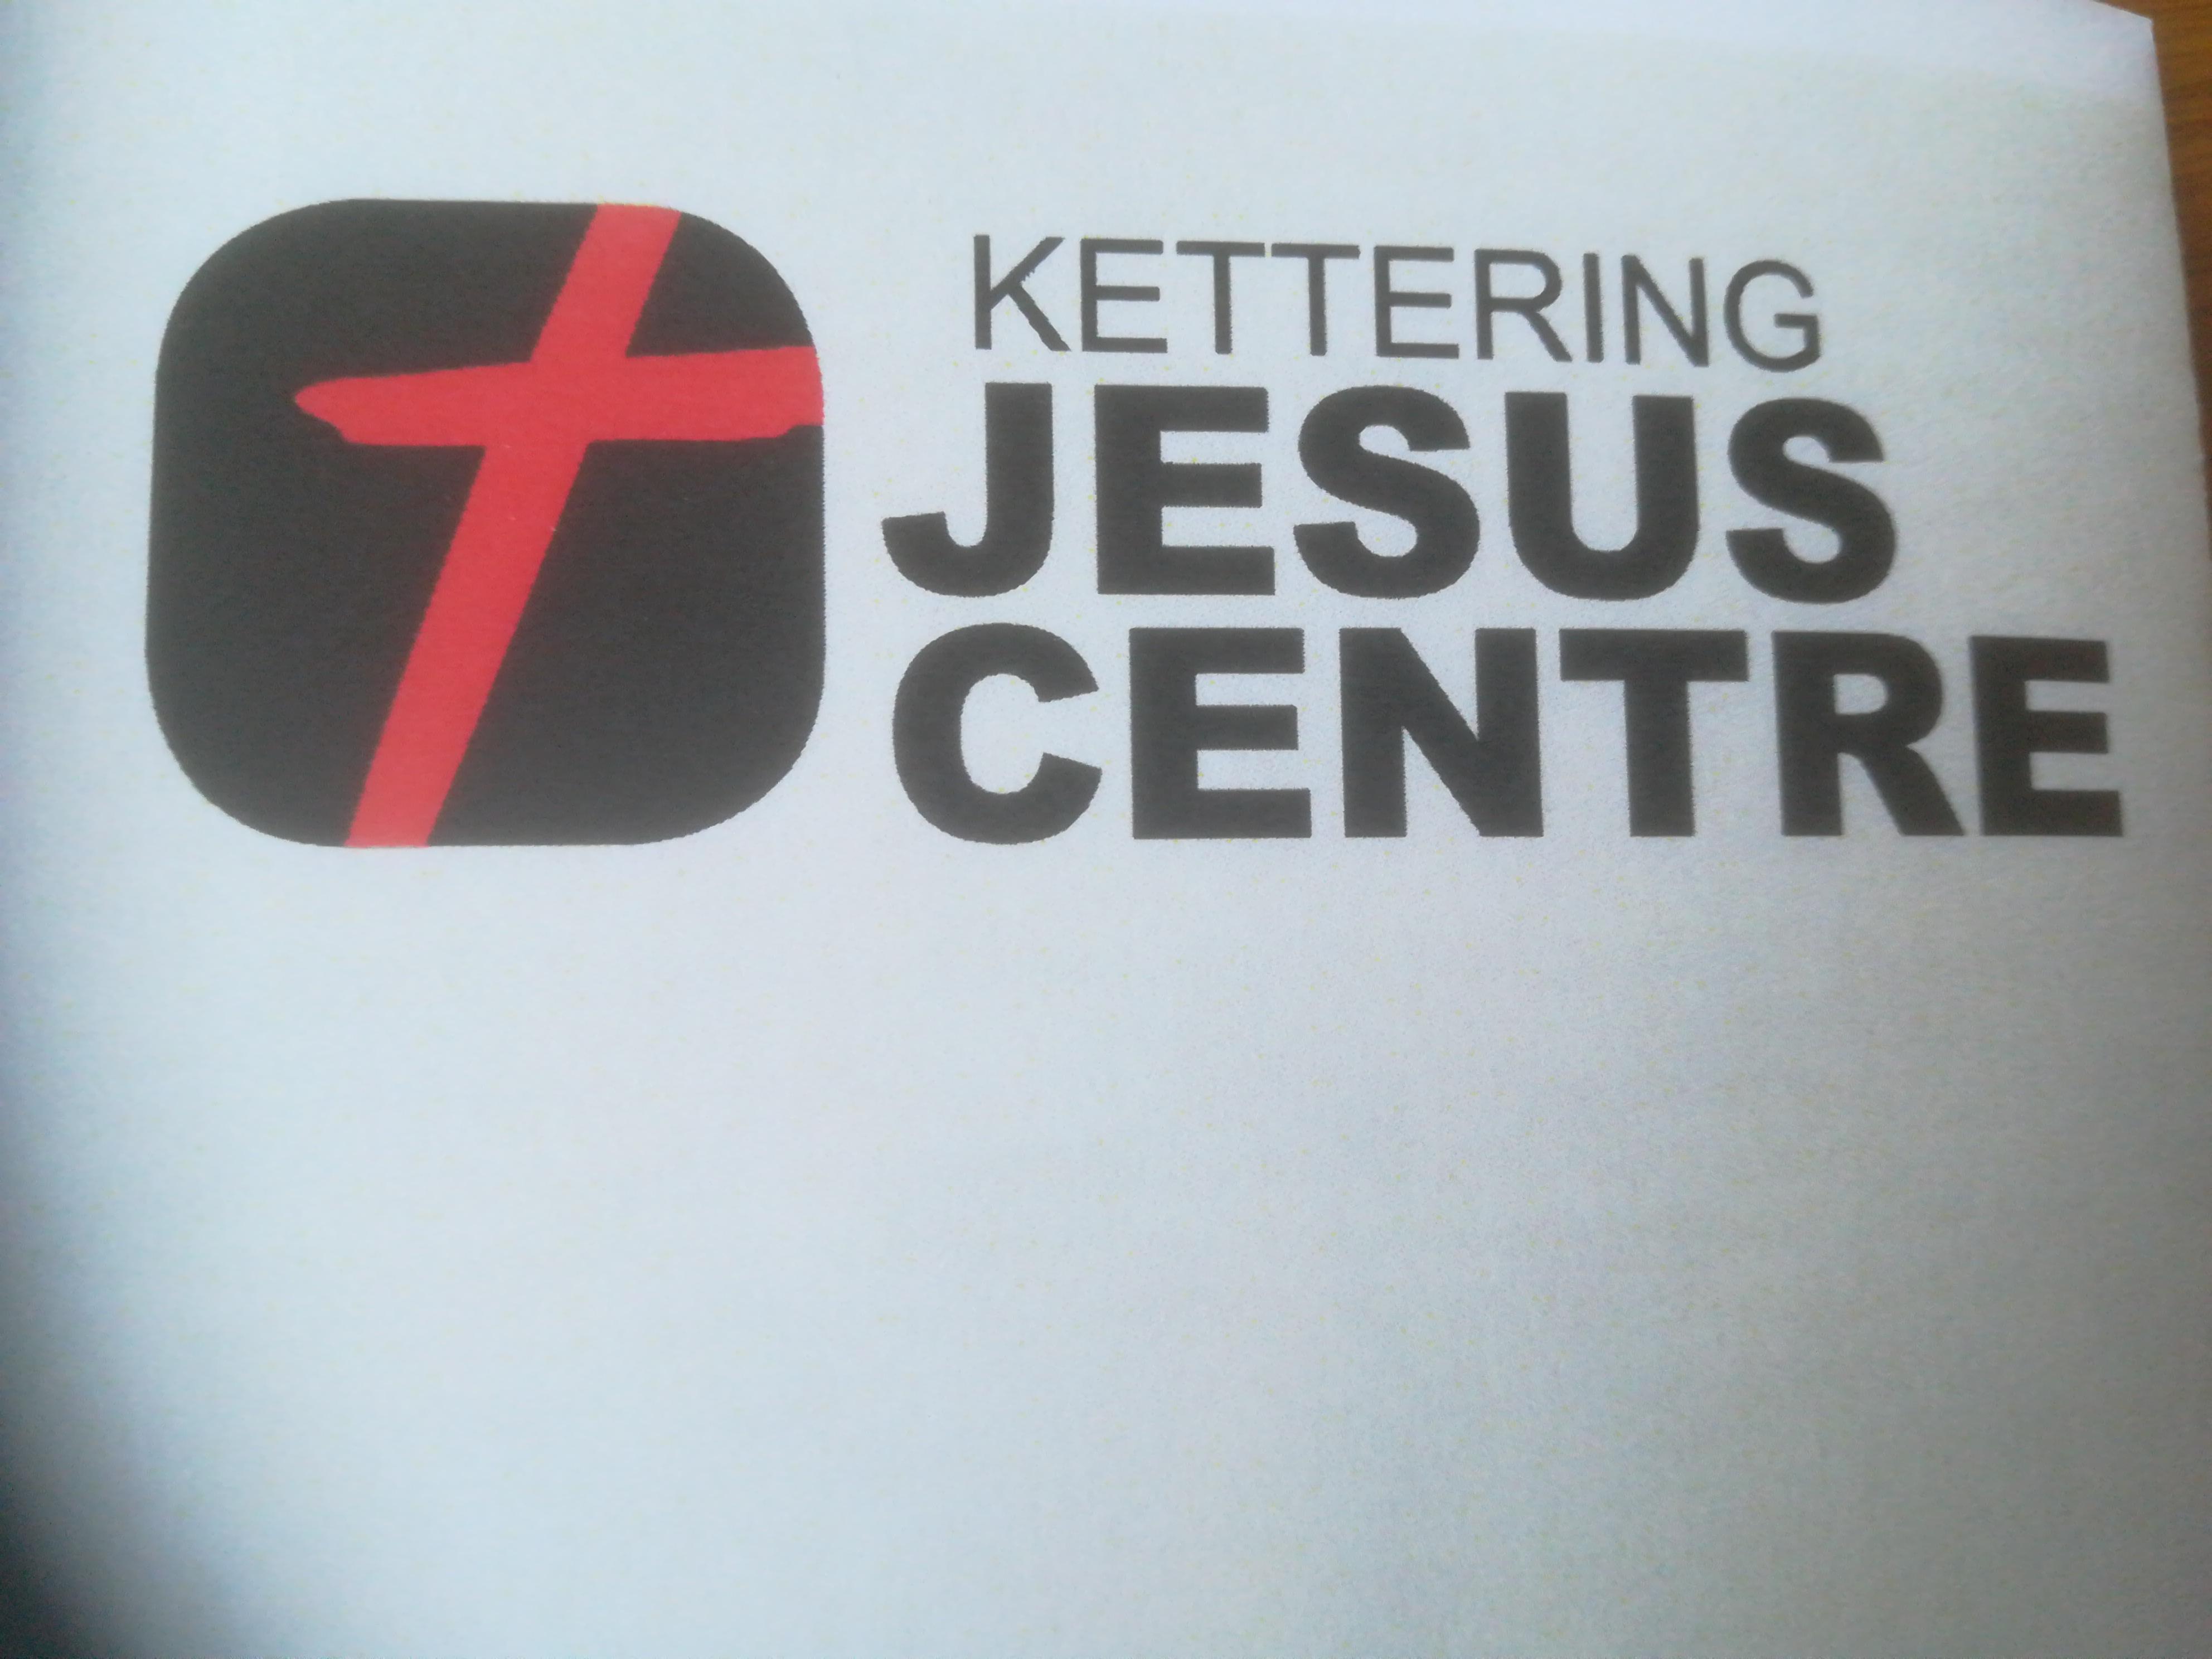 Kettering Jesus Centre